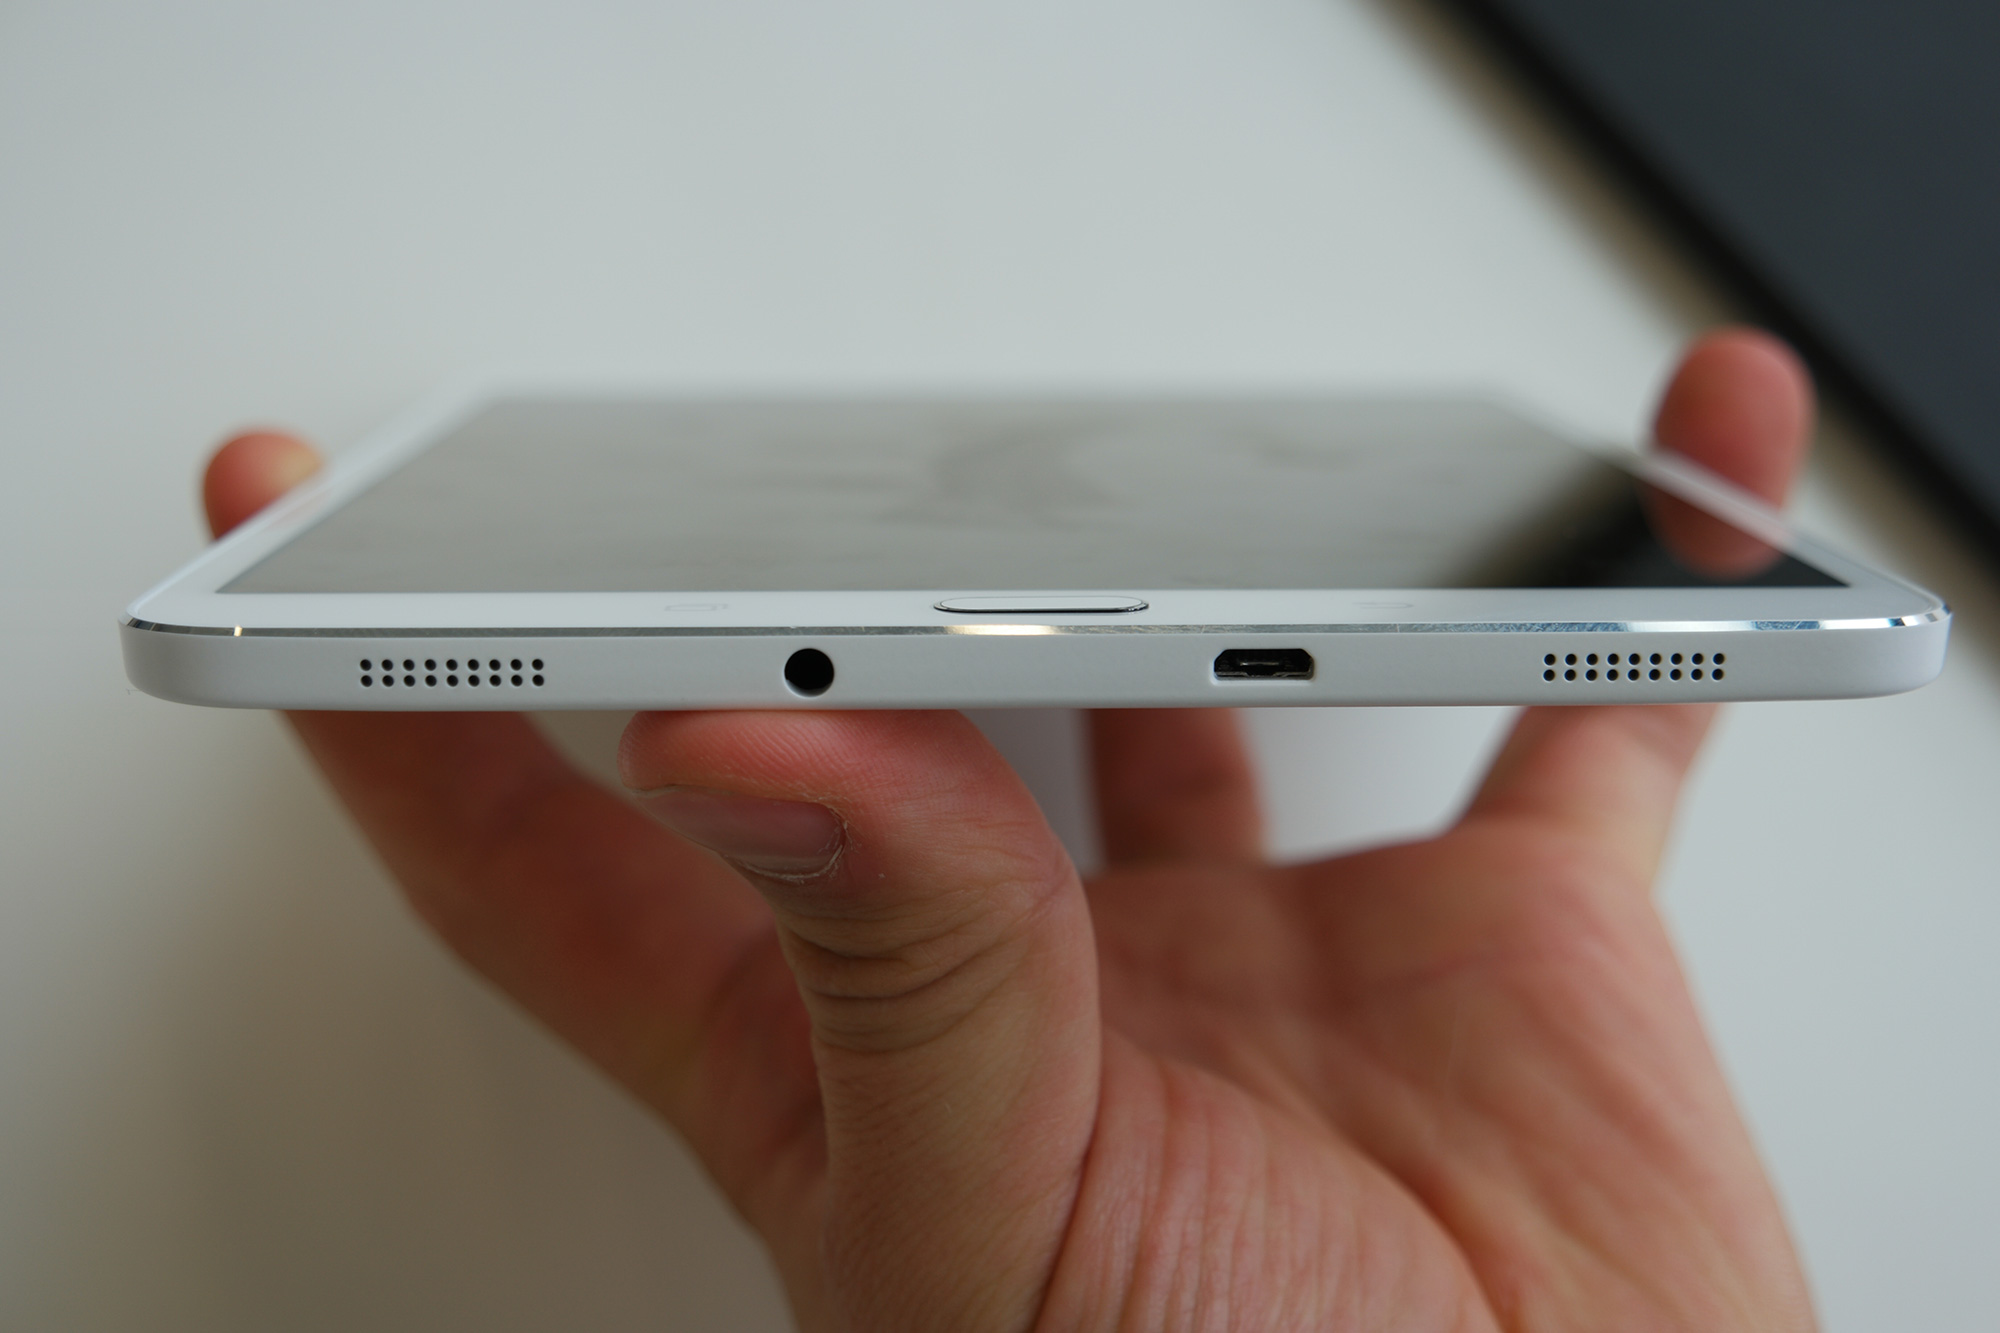 Das Samsung Galaxy Tab S2 8.0 im Hands-On: Für mich fast perfekt